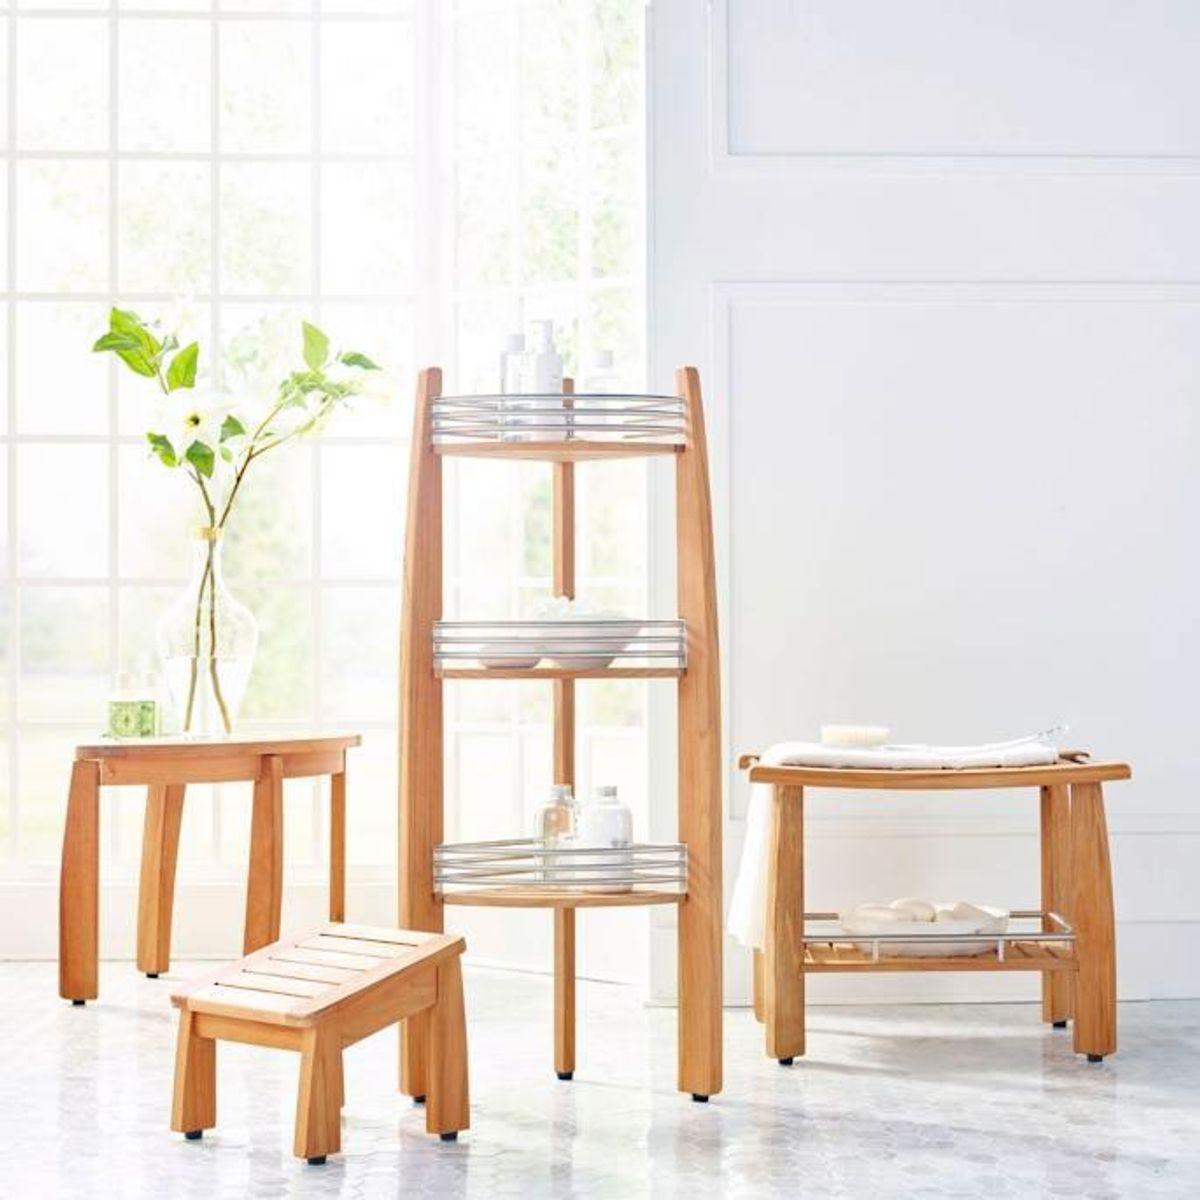 frontgate resort teak bath furniture collection